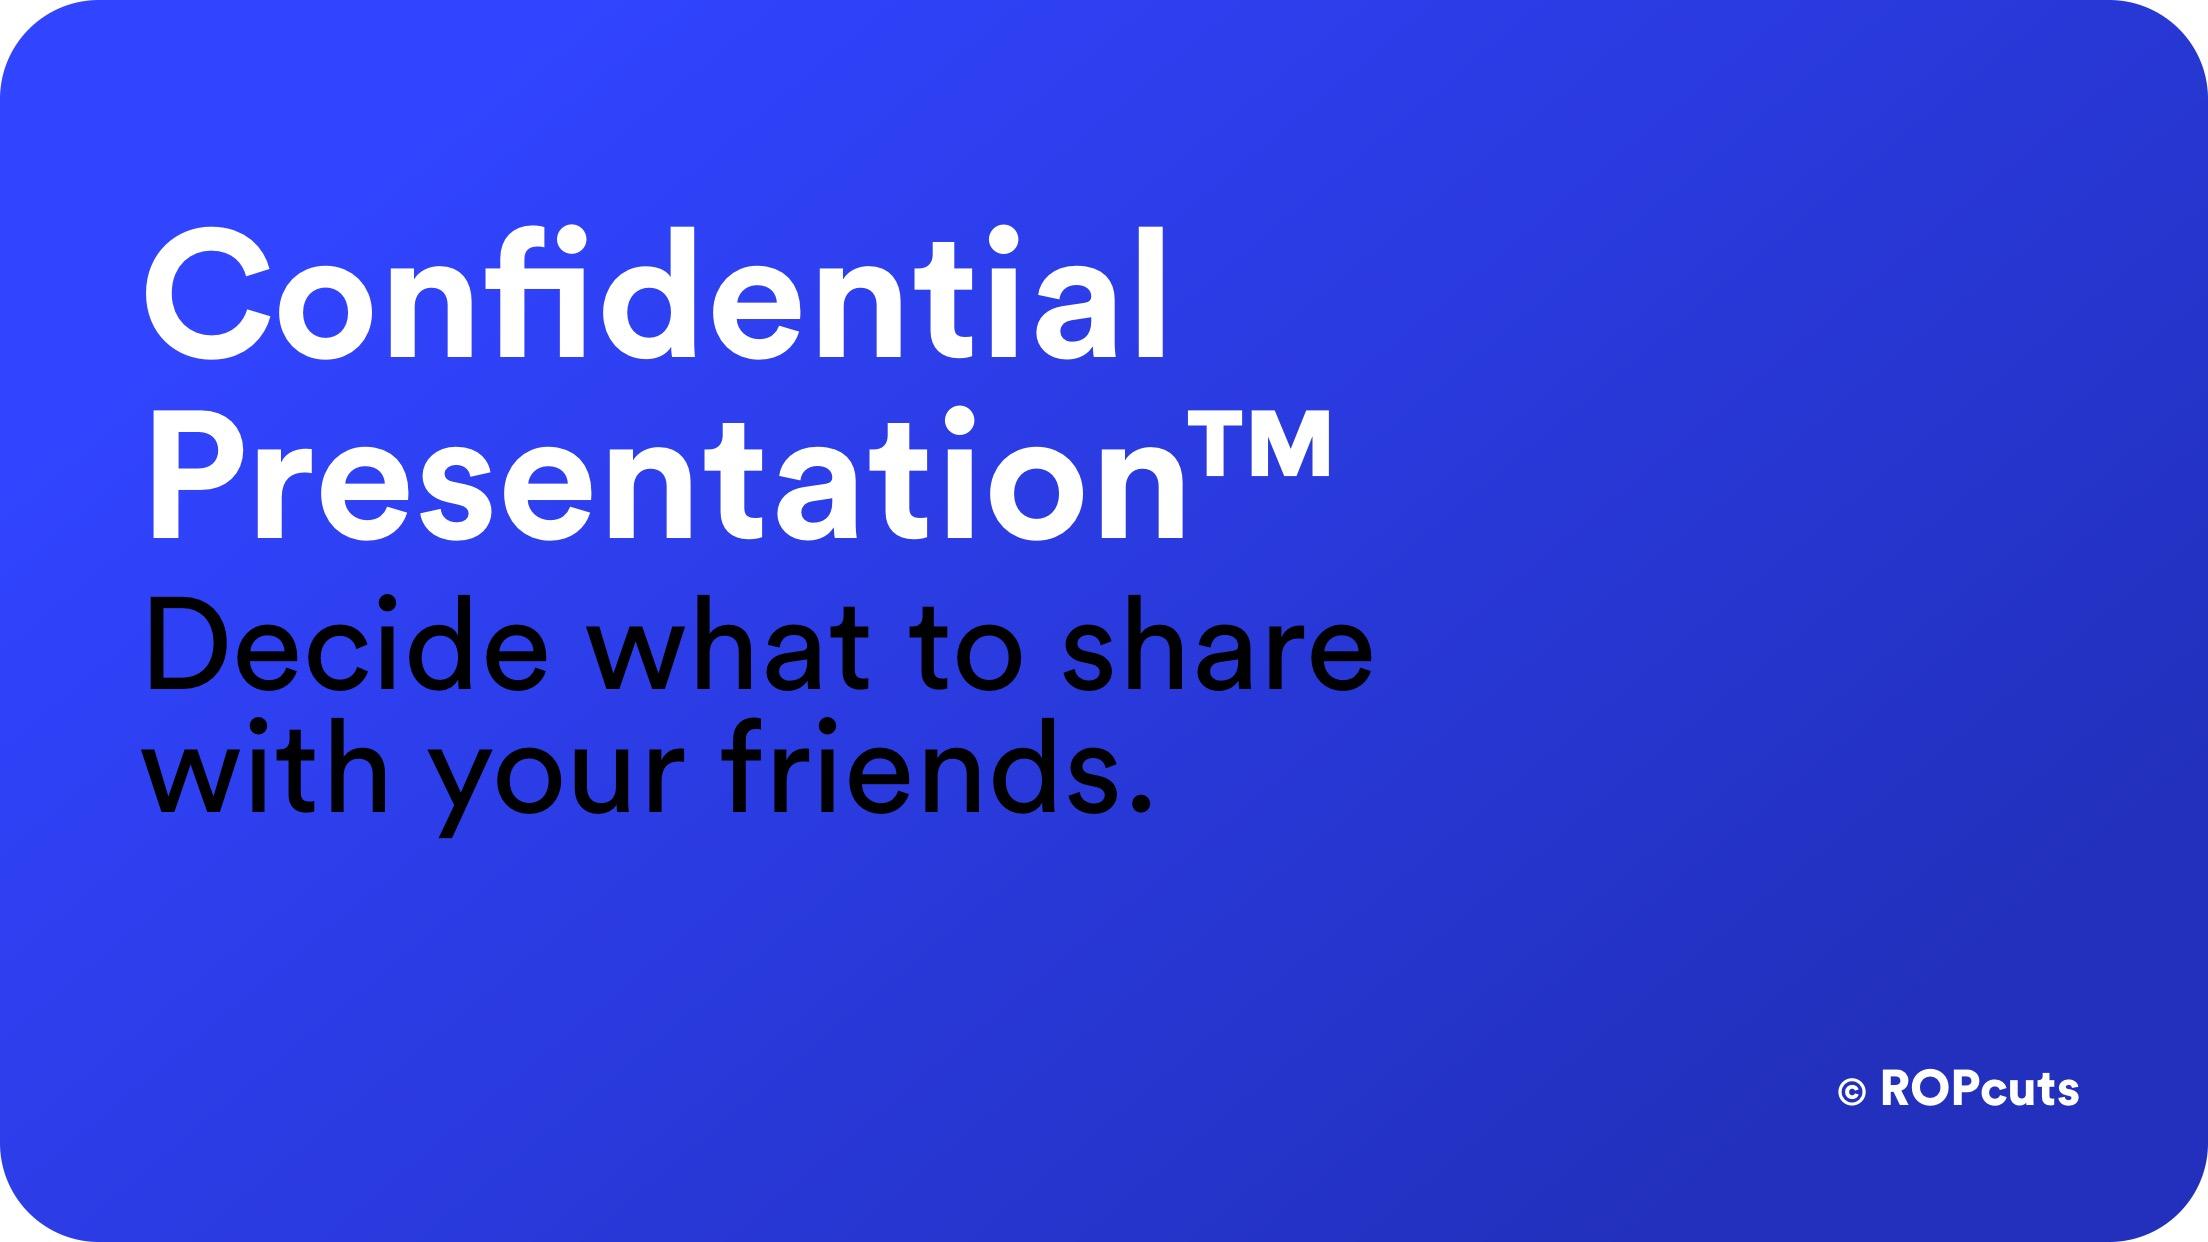 Confidential Presentation